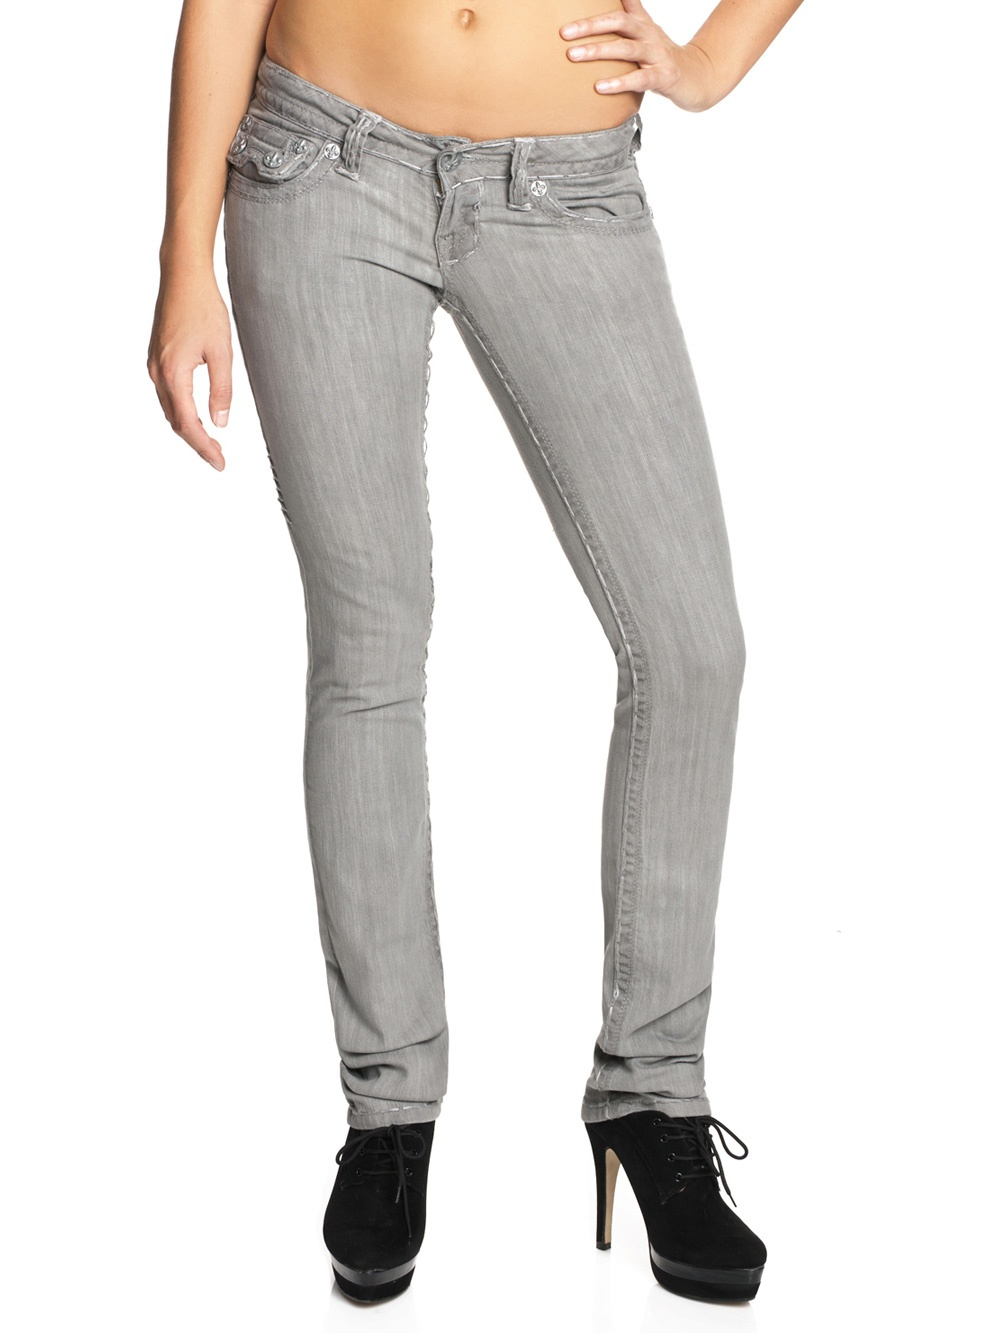 Laguna Beach Jeans Damen Huntington